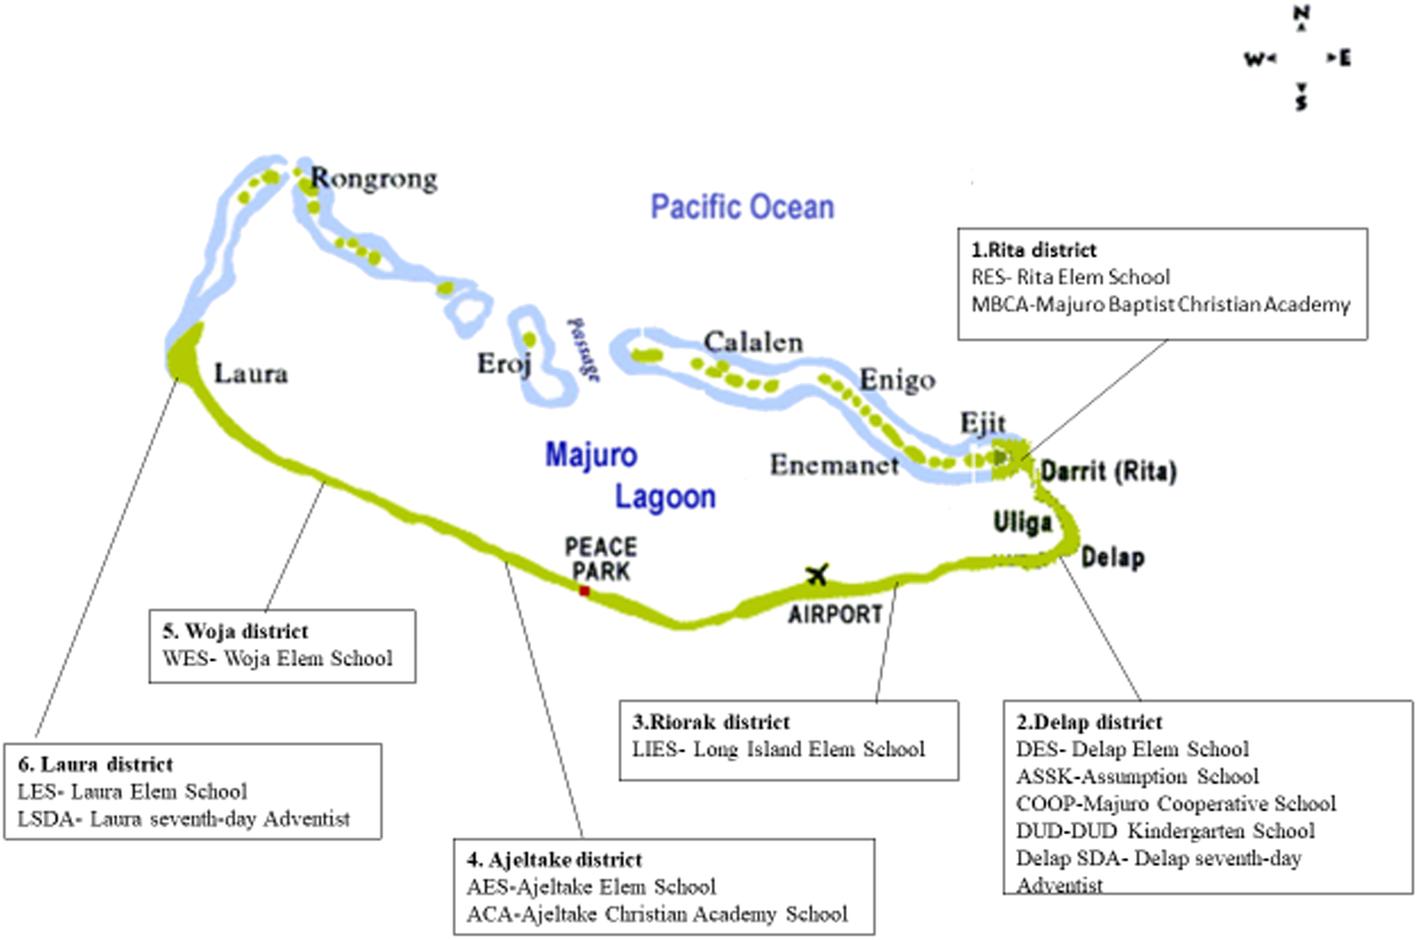 Enterobius vermicularis infection: prevalence and risk ... on kiribati map, tuvalu map, united arab emirates map, el salvador map, marshall islands map, mayotte map, bangladesh map, sri lanka map, senegal map, cook islands map, gambia map, cayman islands map, burkina faso map, costa rica map, india map, papua new guinea map, congo map, saudi arabia map, greenland map, hungary map,